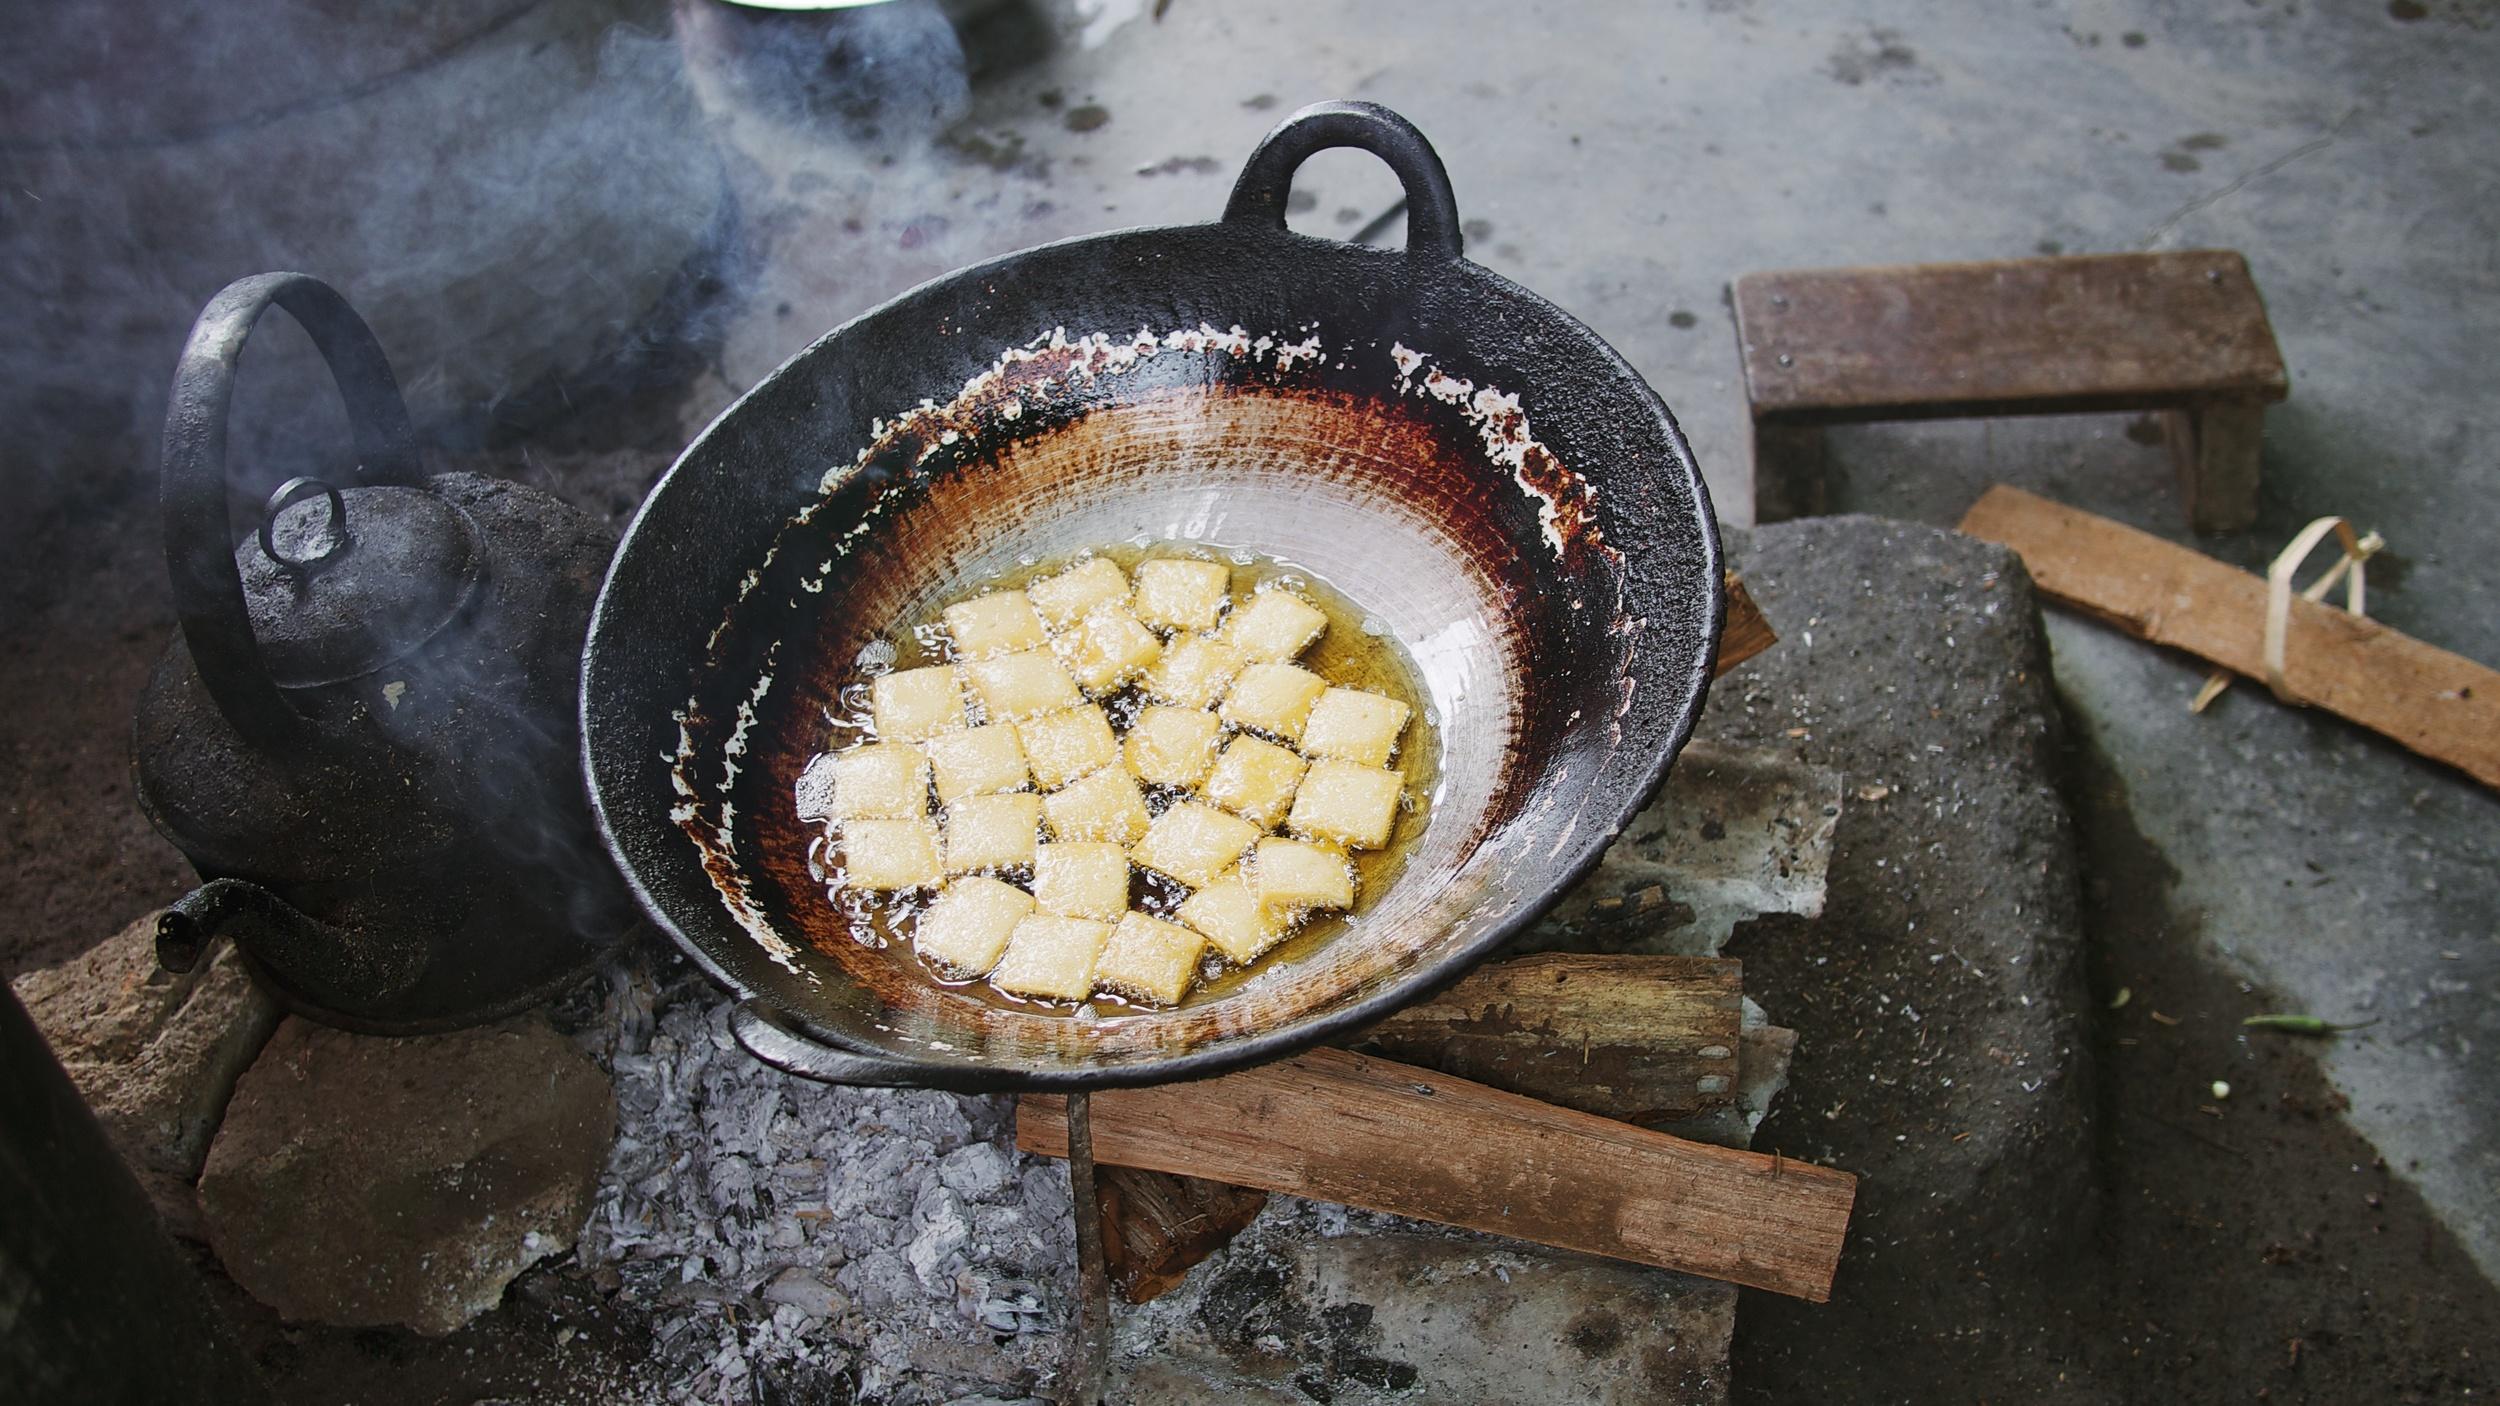 Fresh tofu at the market